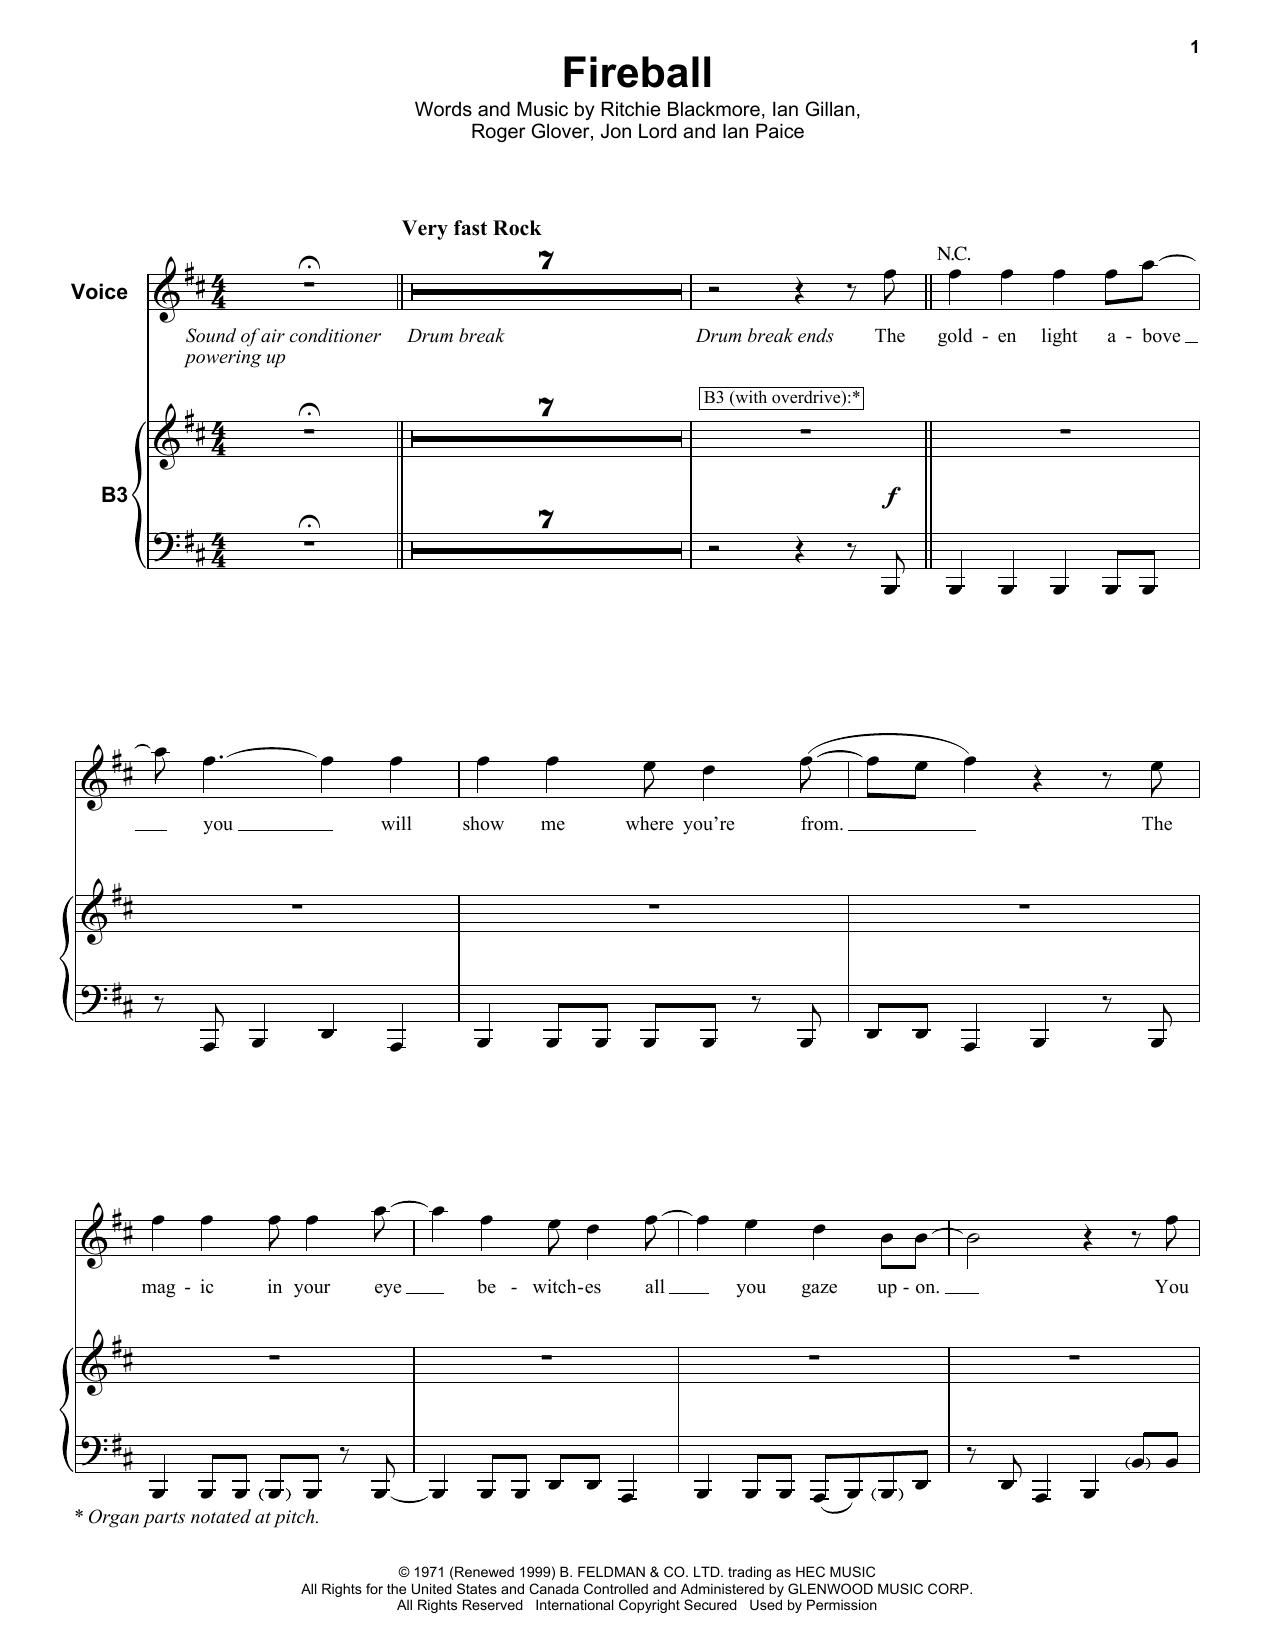 Deep Purple Fireball sheet music notes and chords